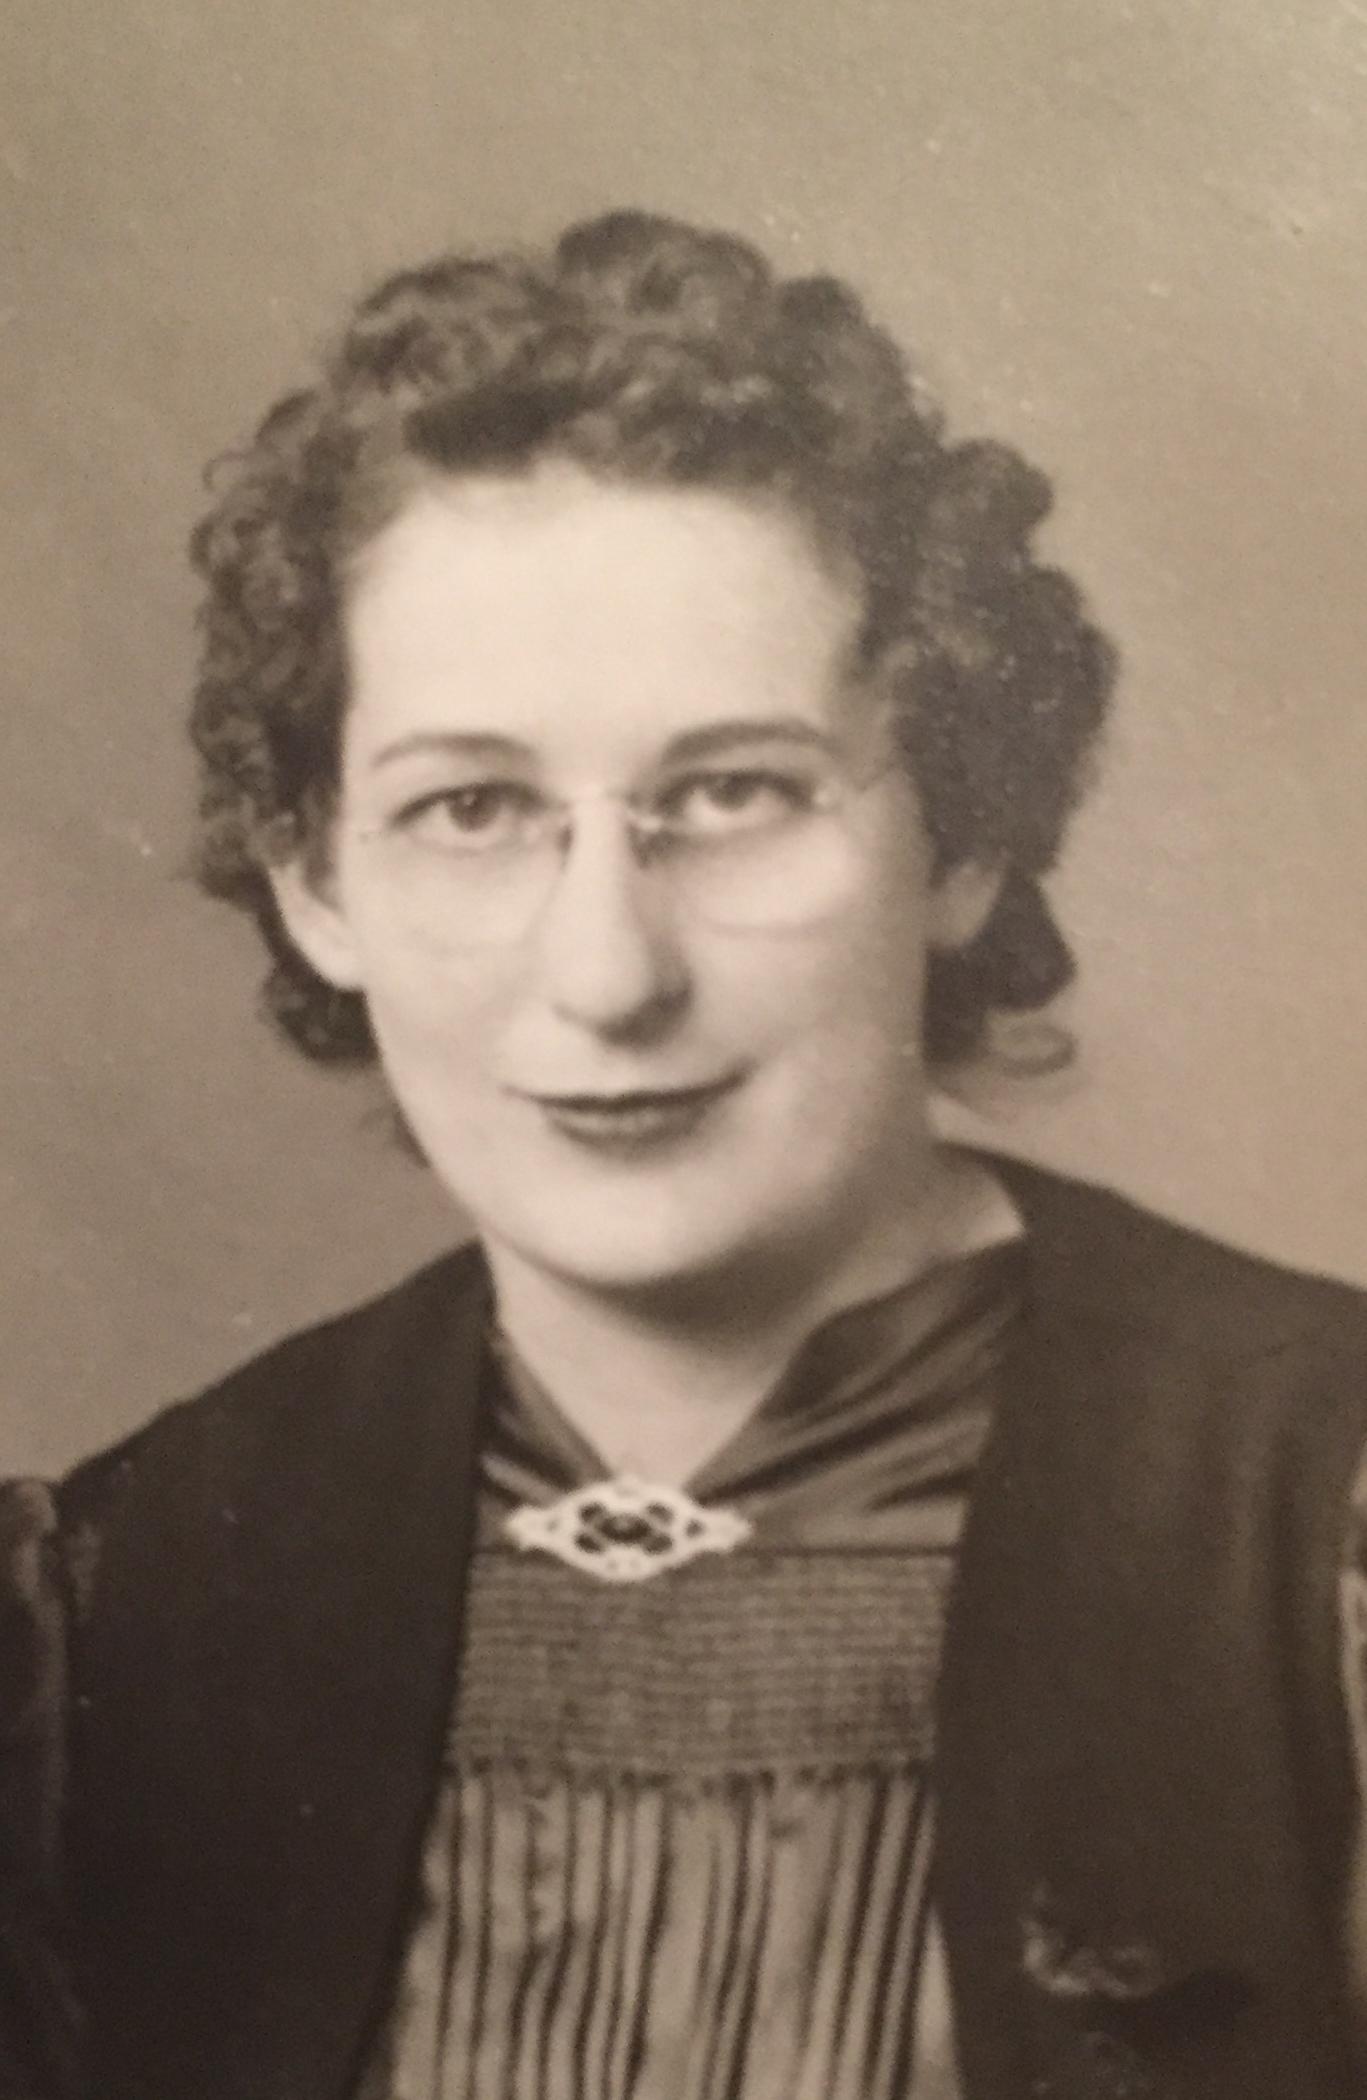 Mardeyl C. Blume